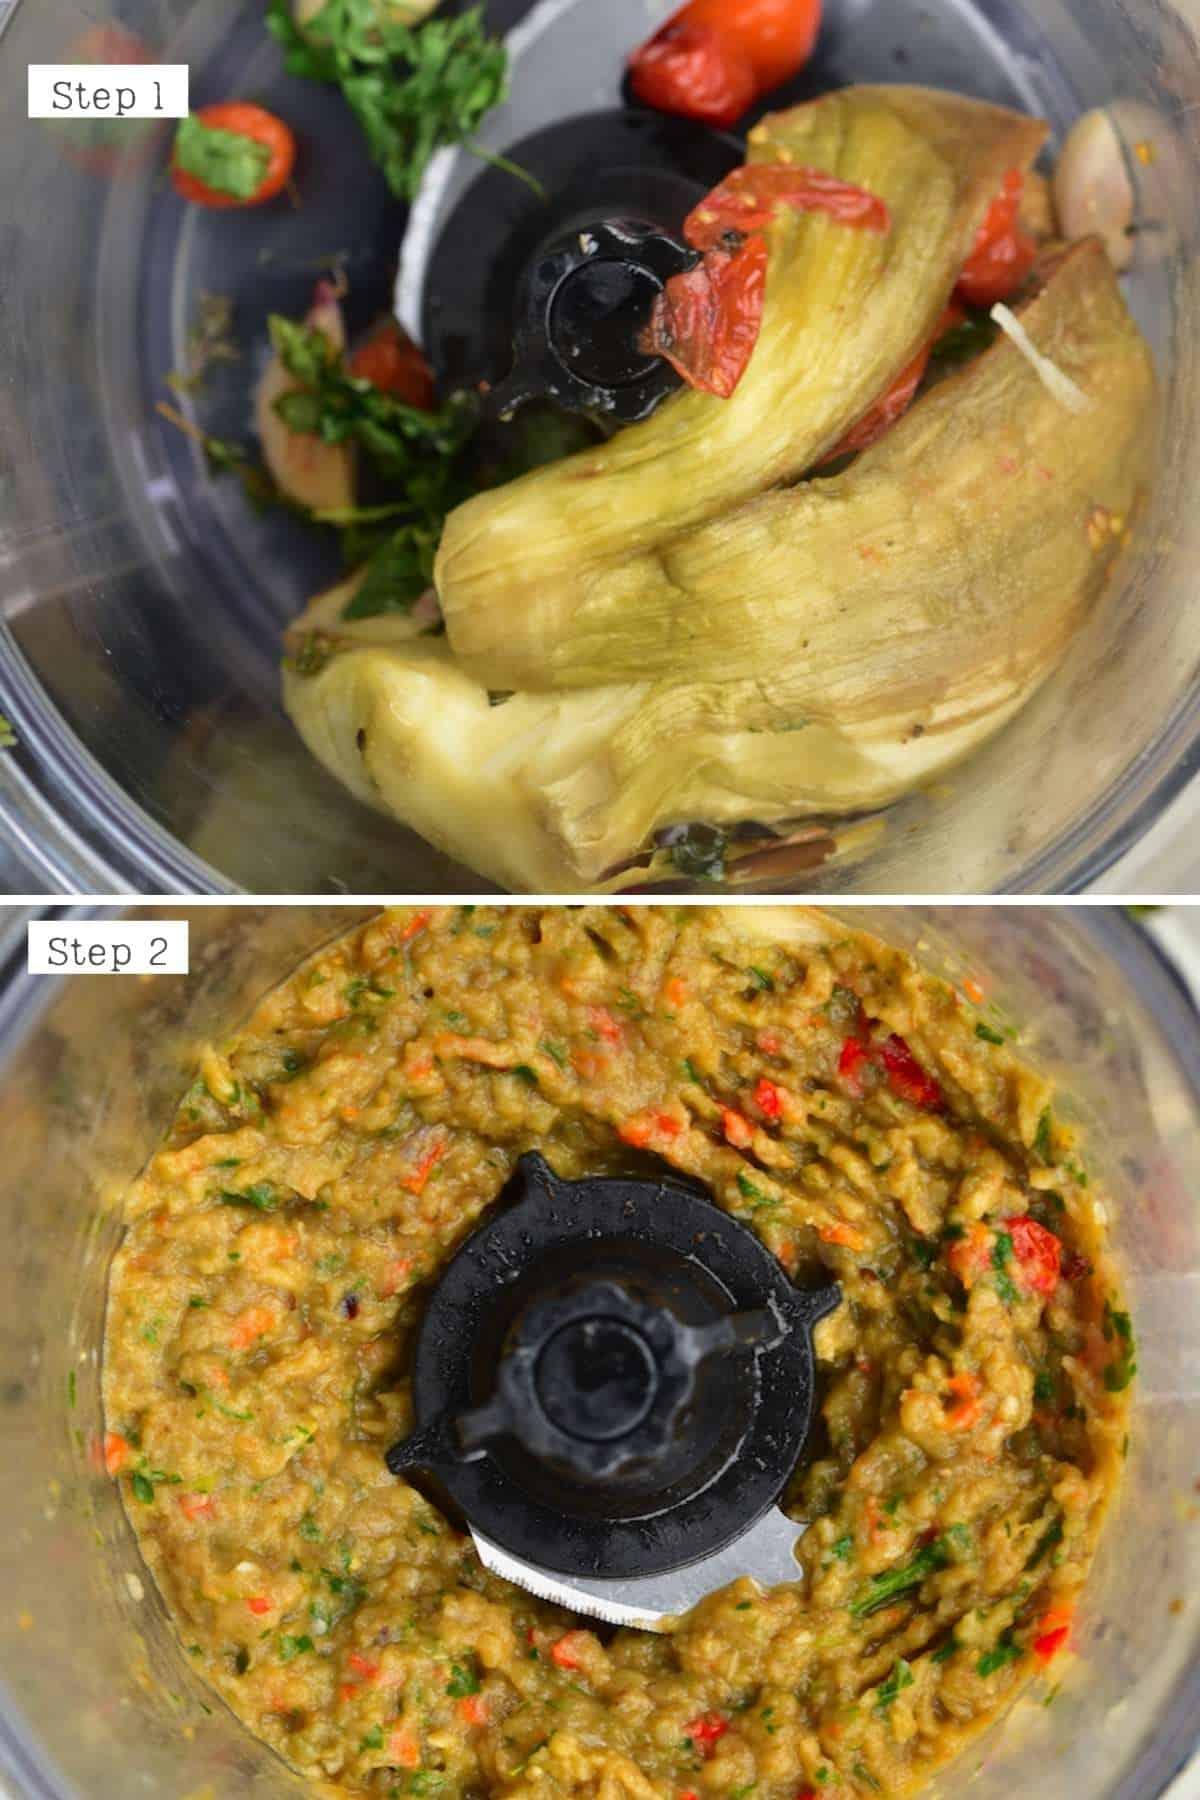 Steps for blending eggplant dip